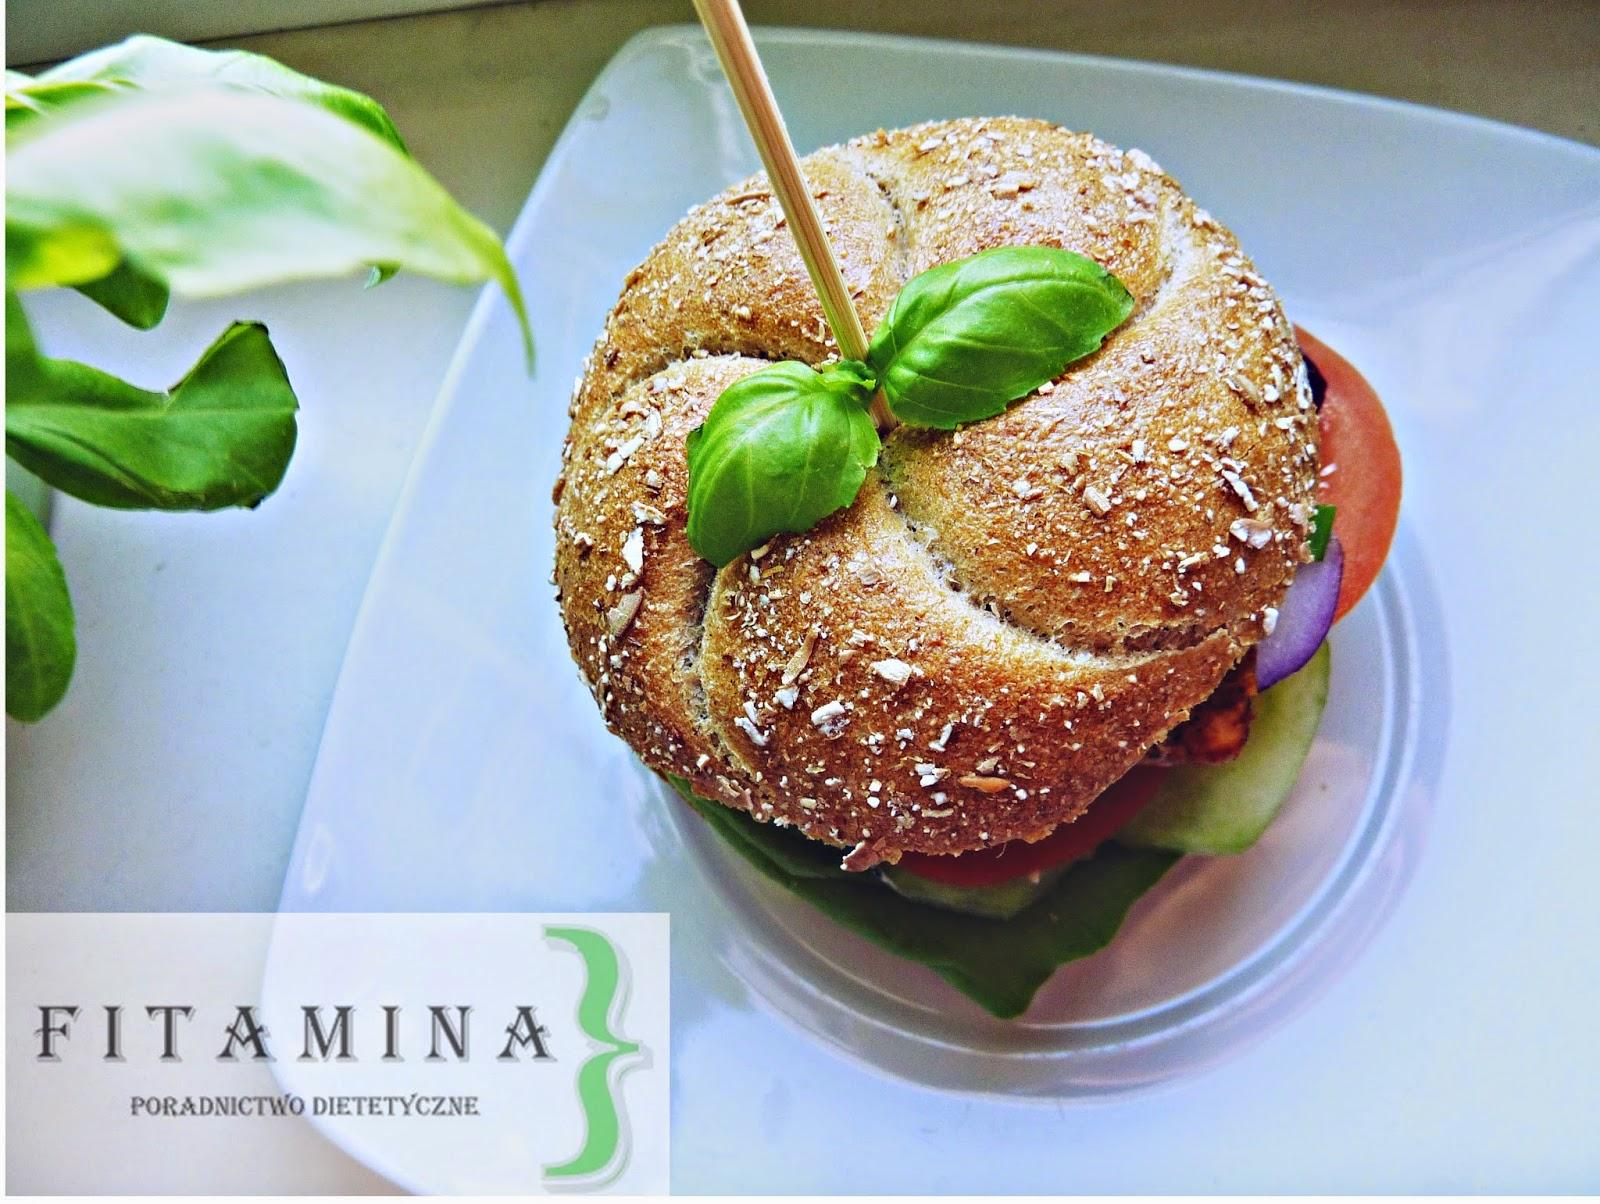 http://bonavita.pl/dietetyczny-hamburger